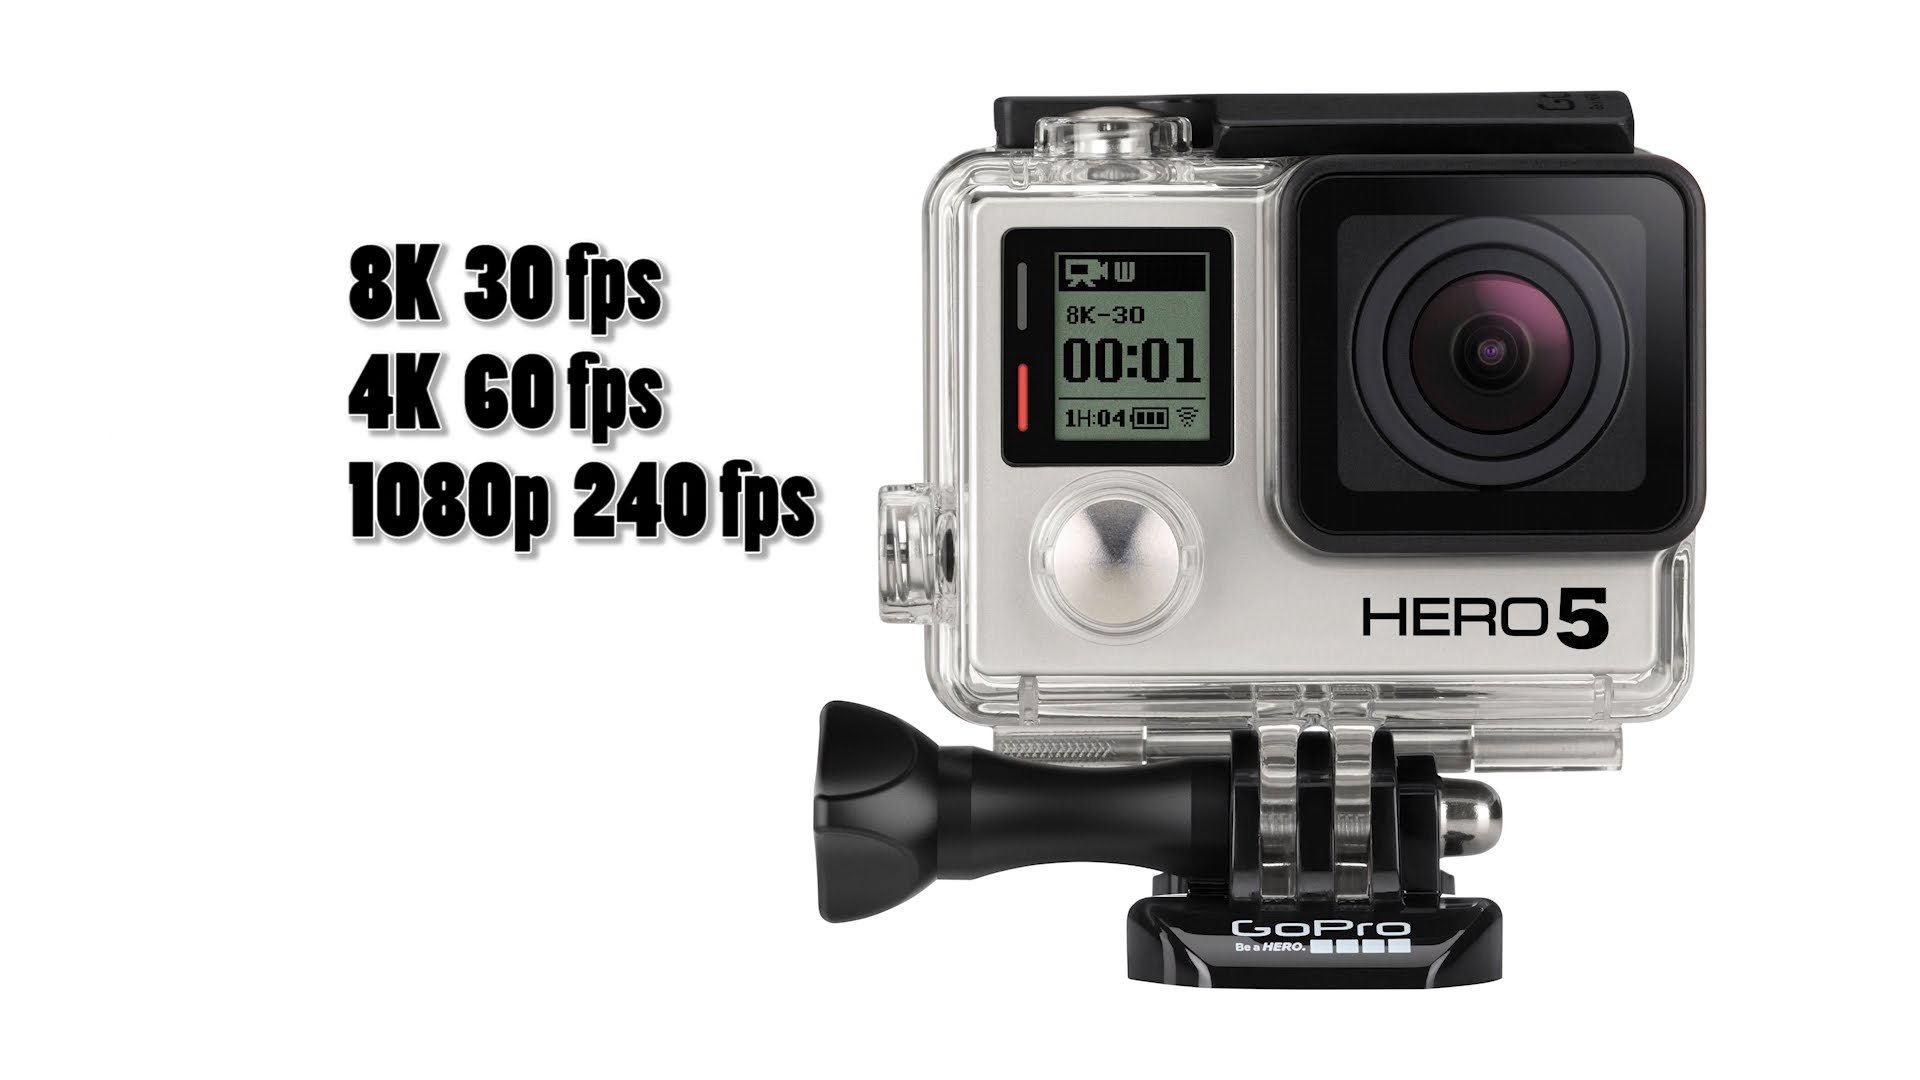 GoPro Hero 5 First Look